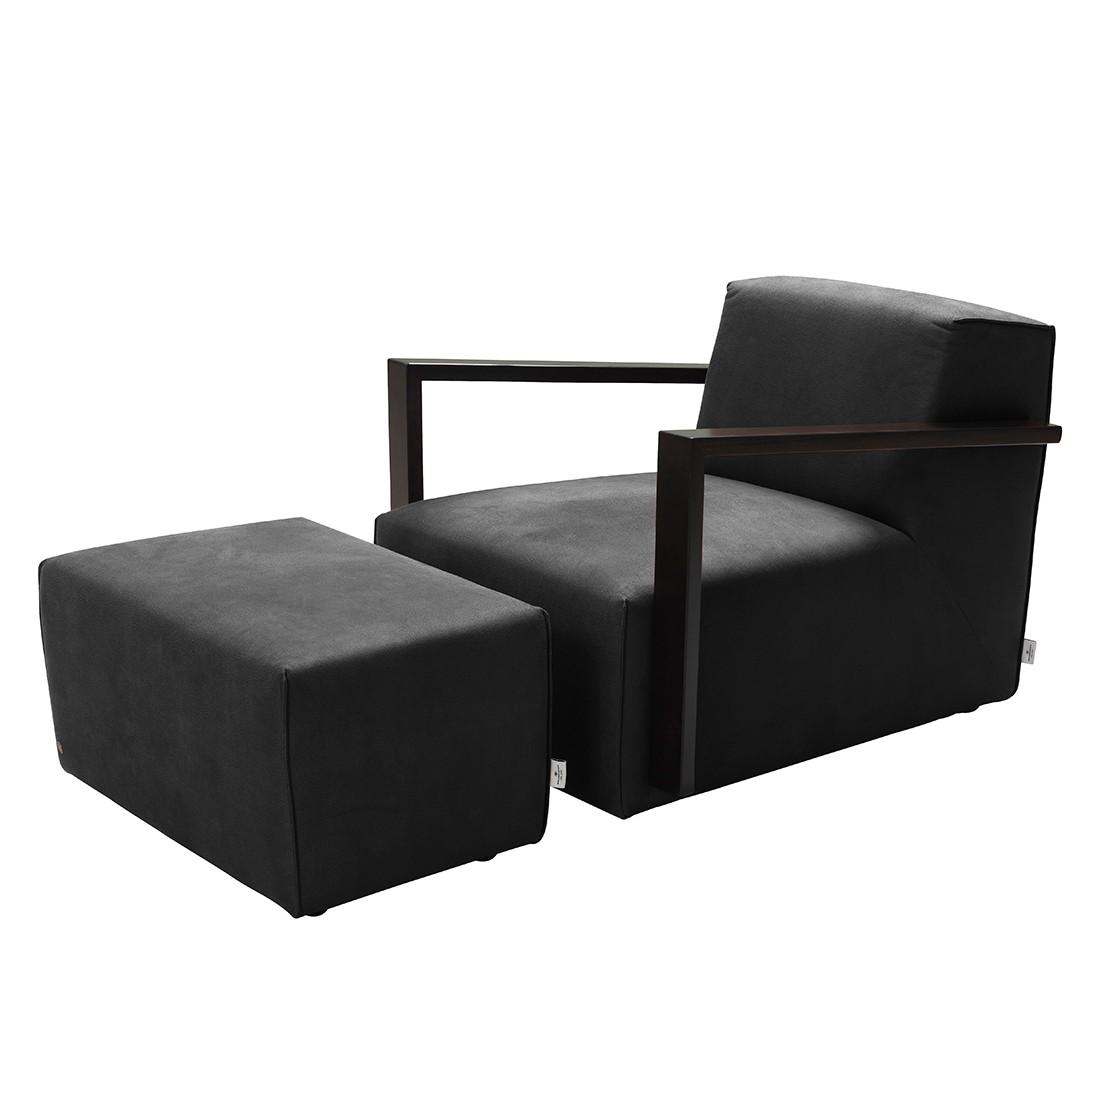 Home 24 - Fauteuil lazy - imitation cuir aspect vieilli - avec repose-pieds - noir, tom tailor